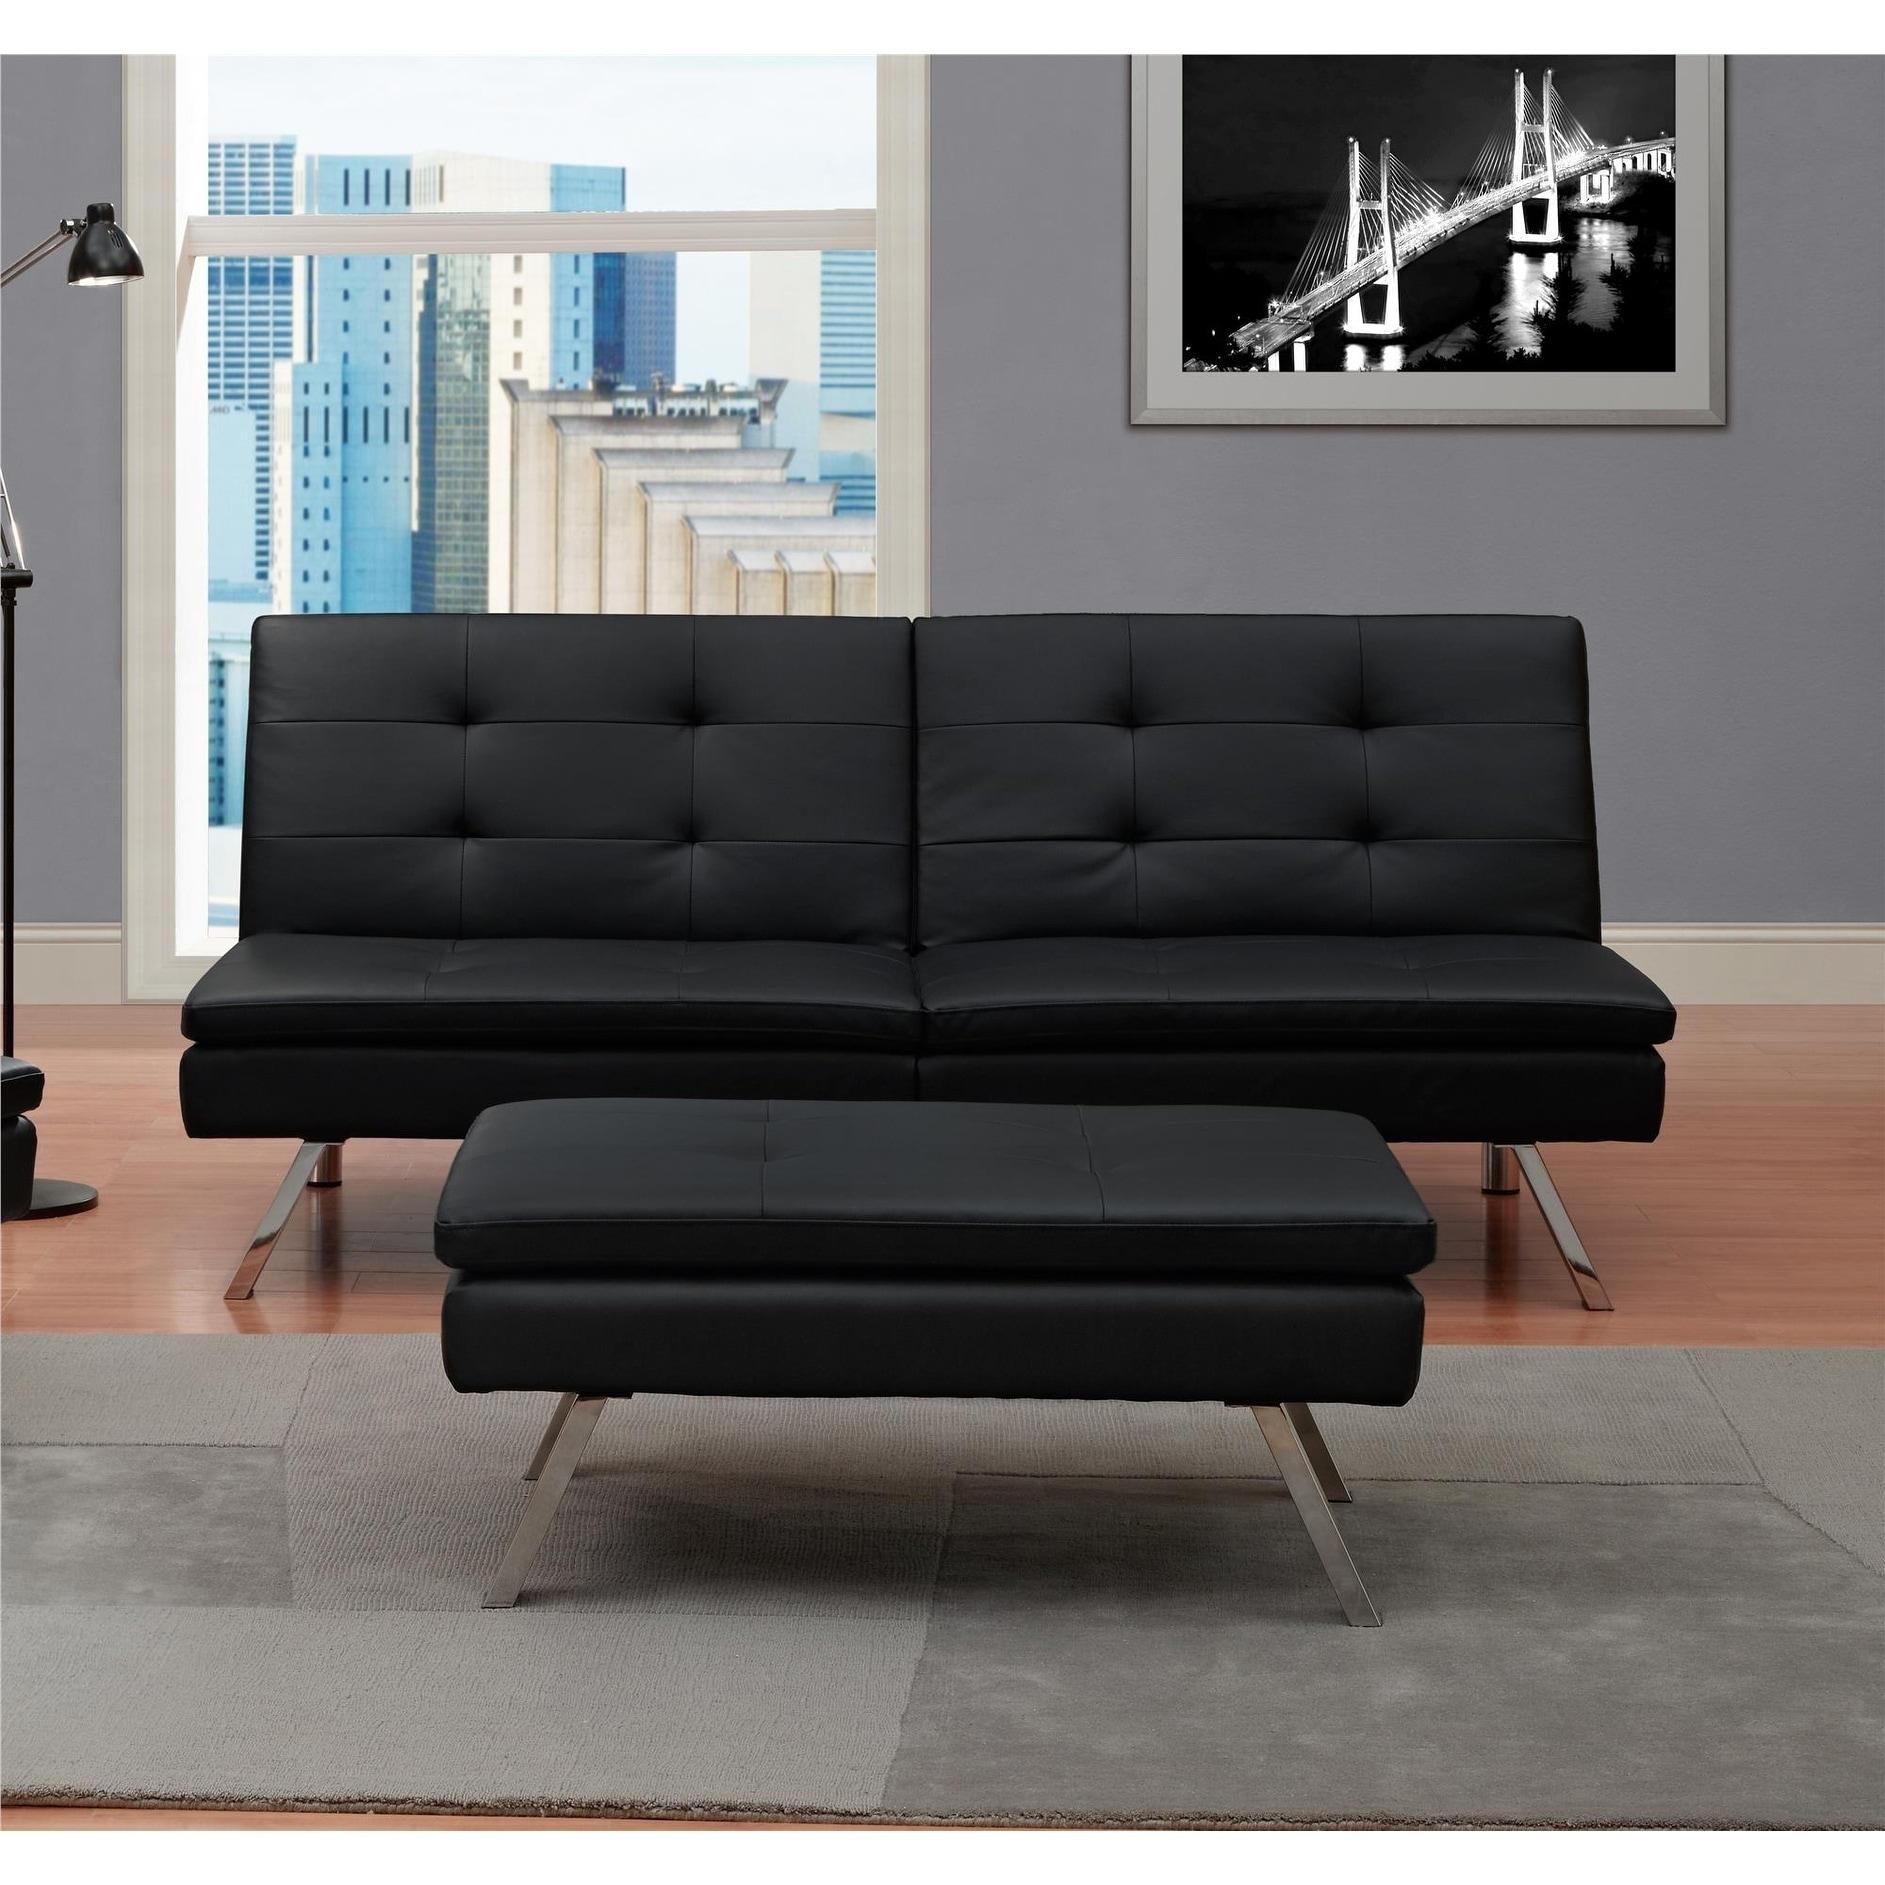 Pleasing Dhp Chelsea Black Sectional Futon With Ottoman Lamtechconsult Wood Chair Design Ideas Lamtechconsultcom